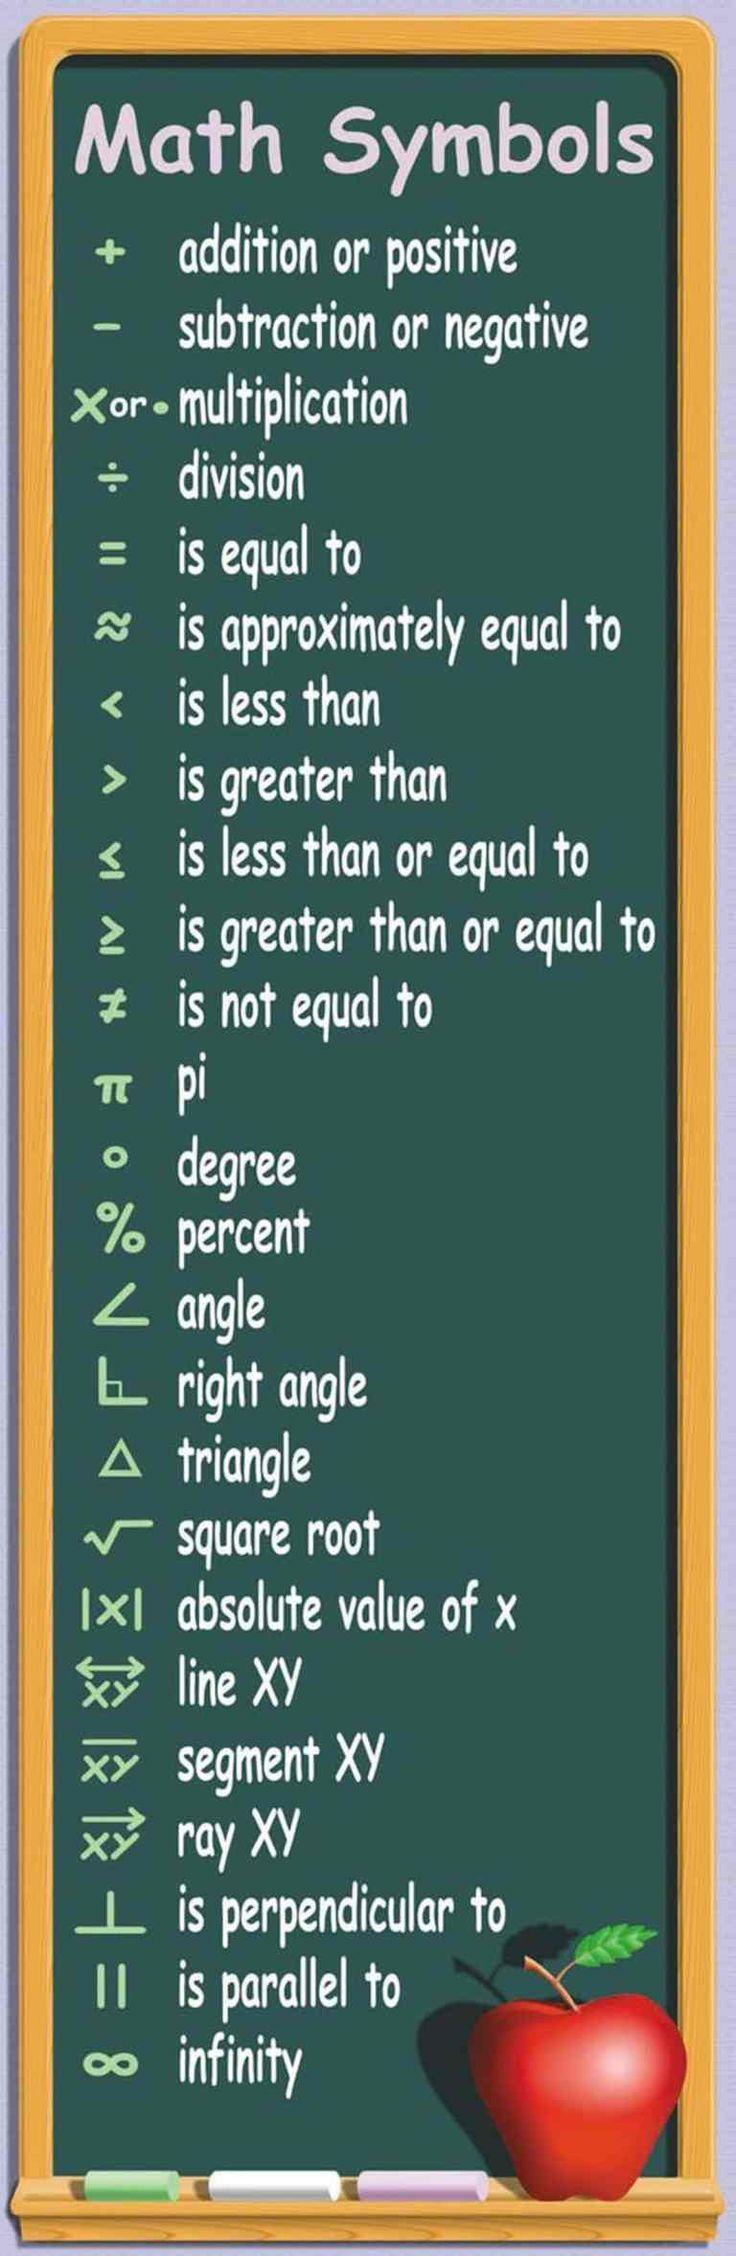 2413 best Math games/ Instructions images on Pinterest ...